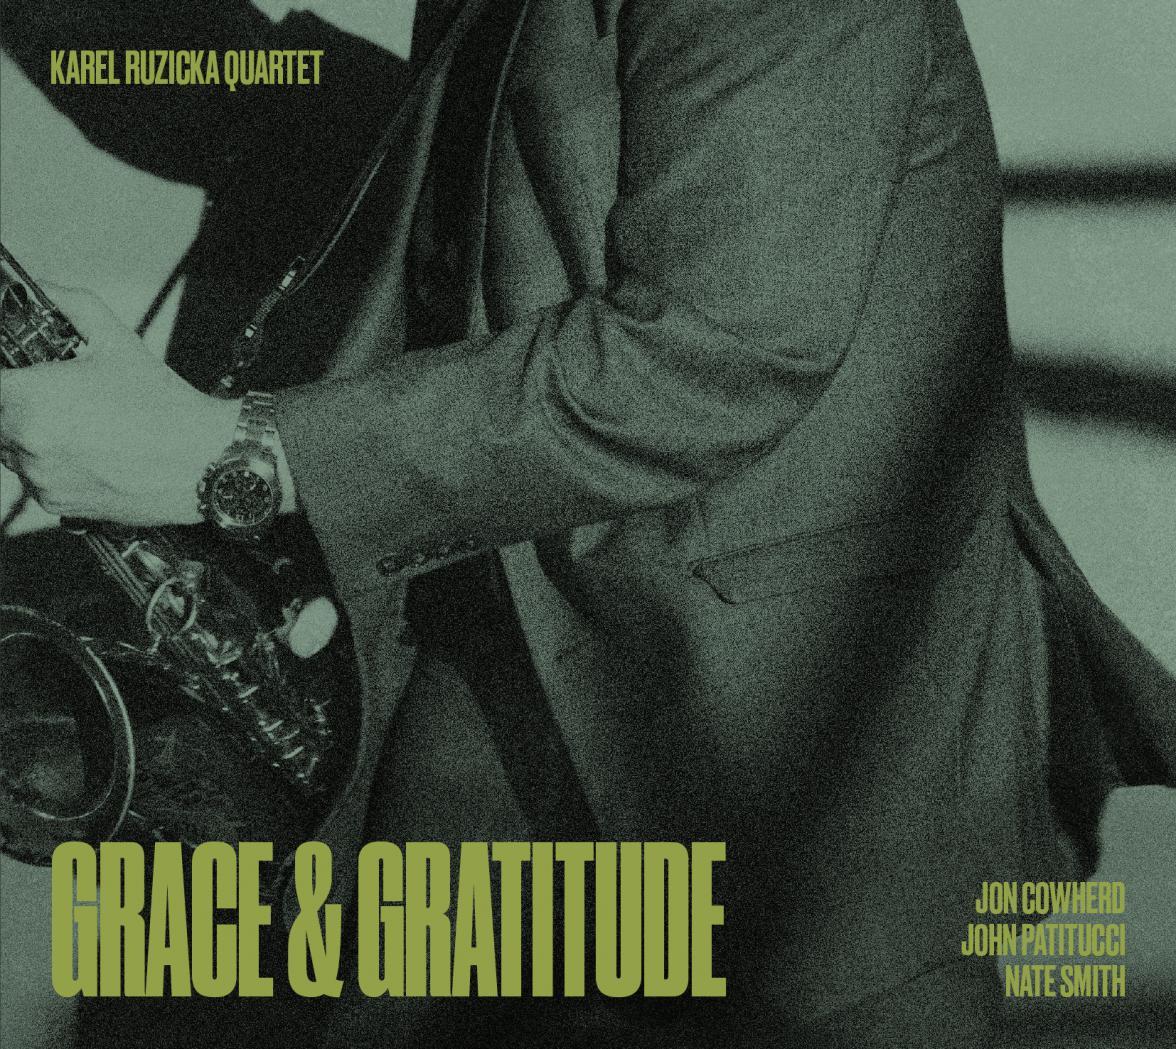 Karel Ruzicka Quartet: Grace & Gratitude